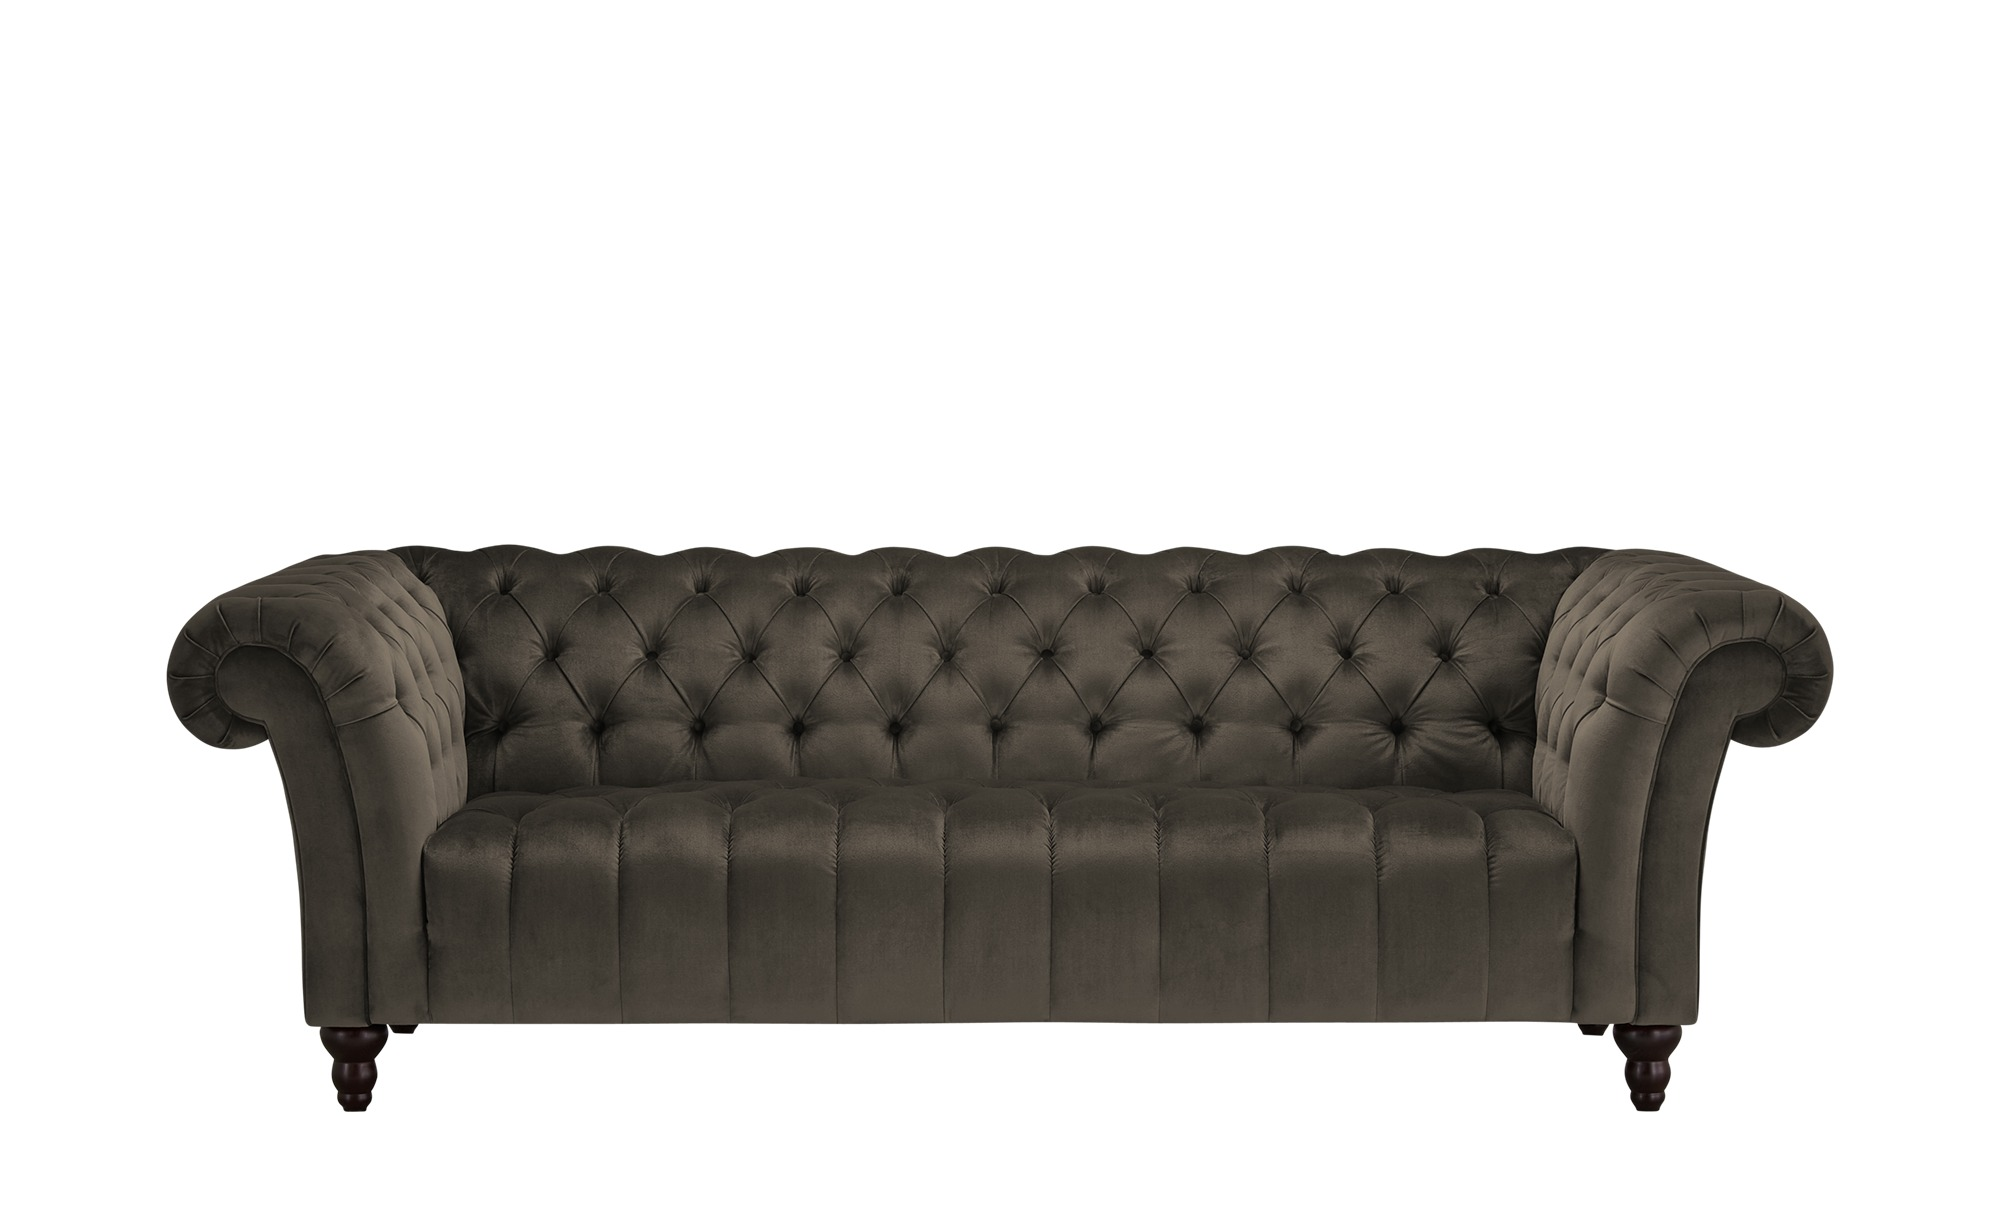 Big Sofa  Canyon ¦ braun ¦ Maße (cm): B: 230 H: 74 T: 101 Polstermöbel > Sofas > Big-Sofas - Höffner